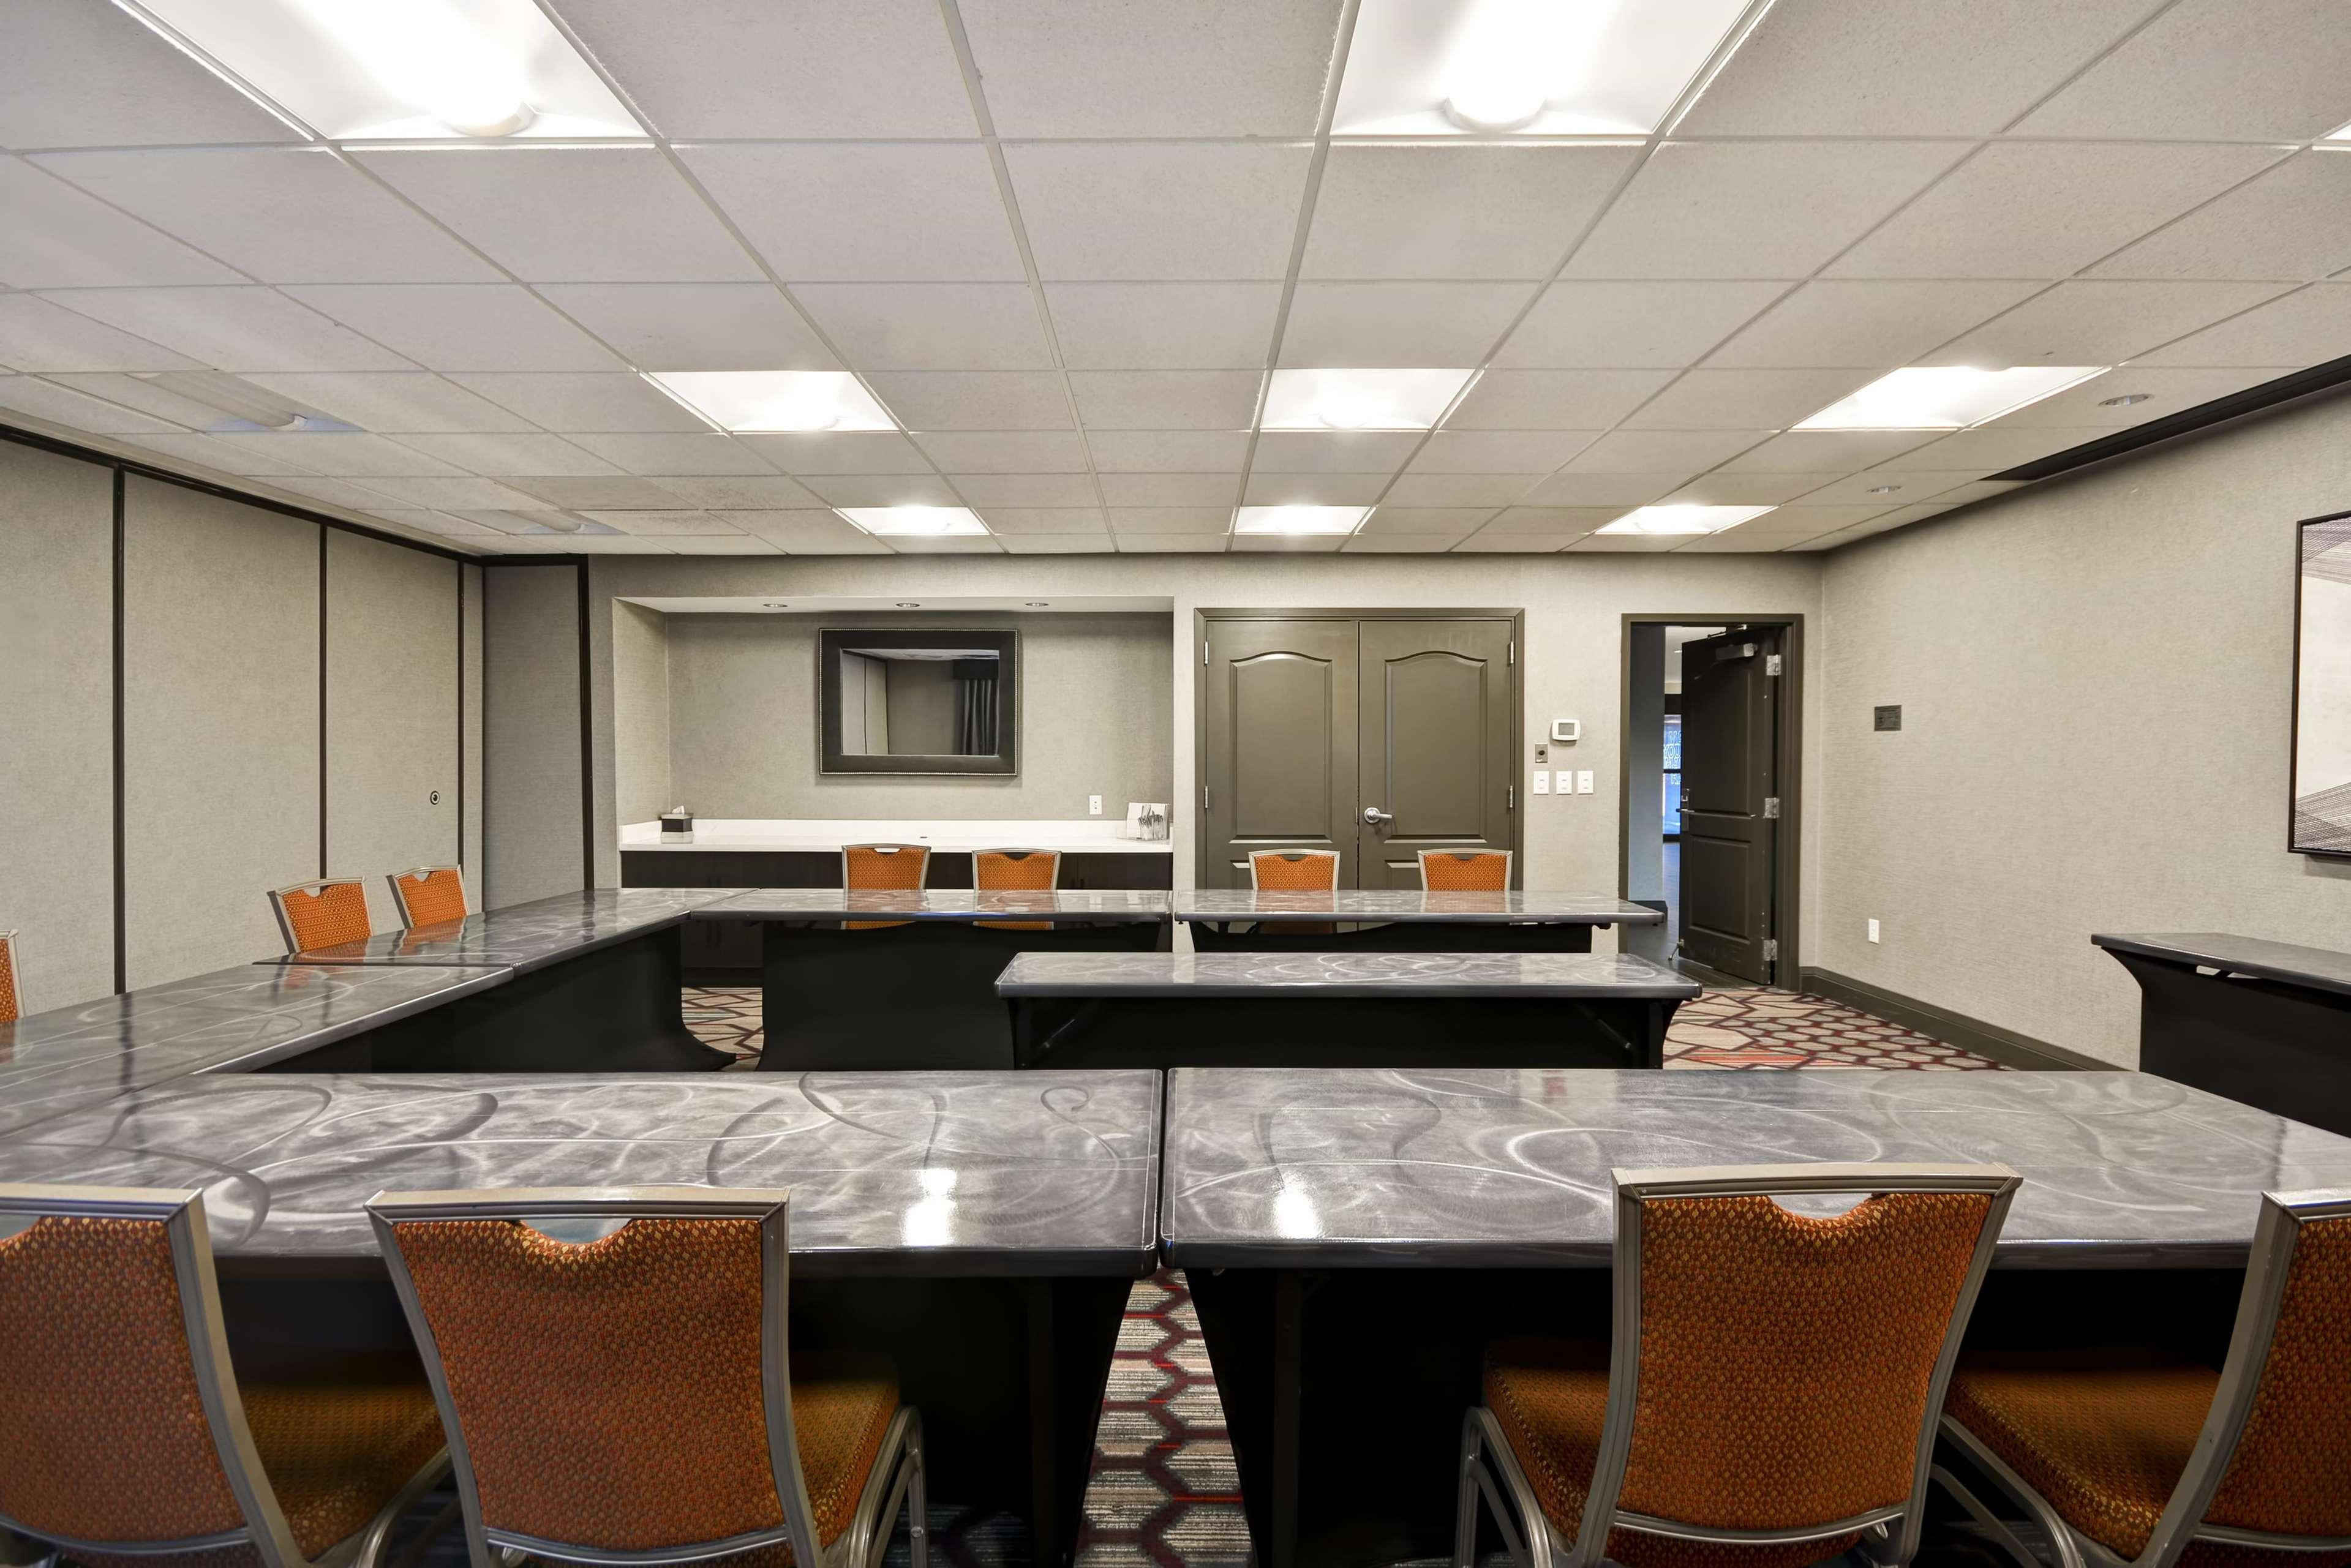 Hampton Inn & Suites Columbus-Easton Area image 59